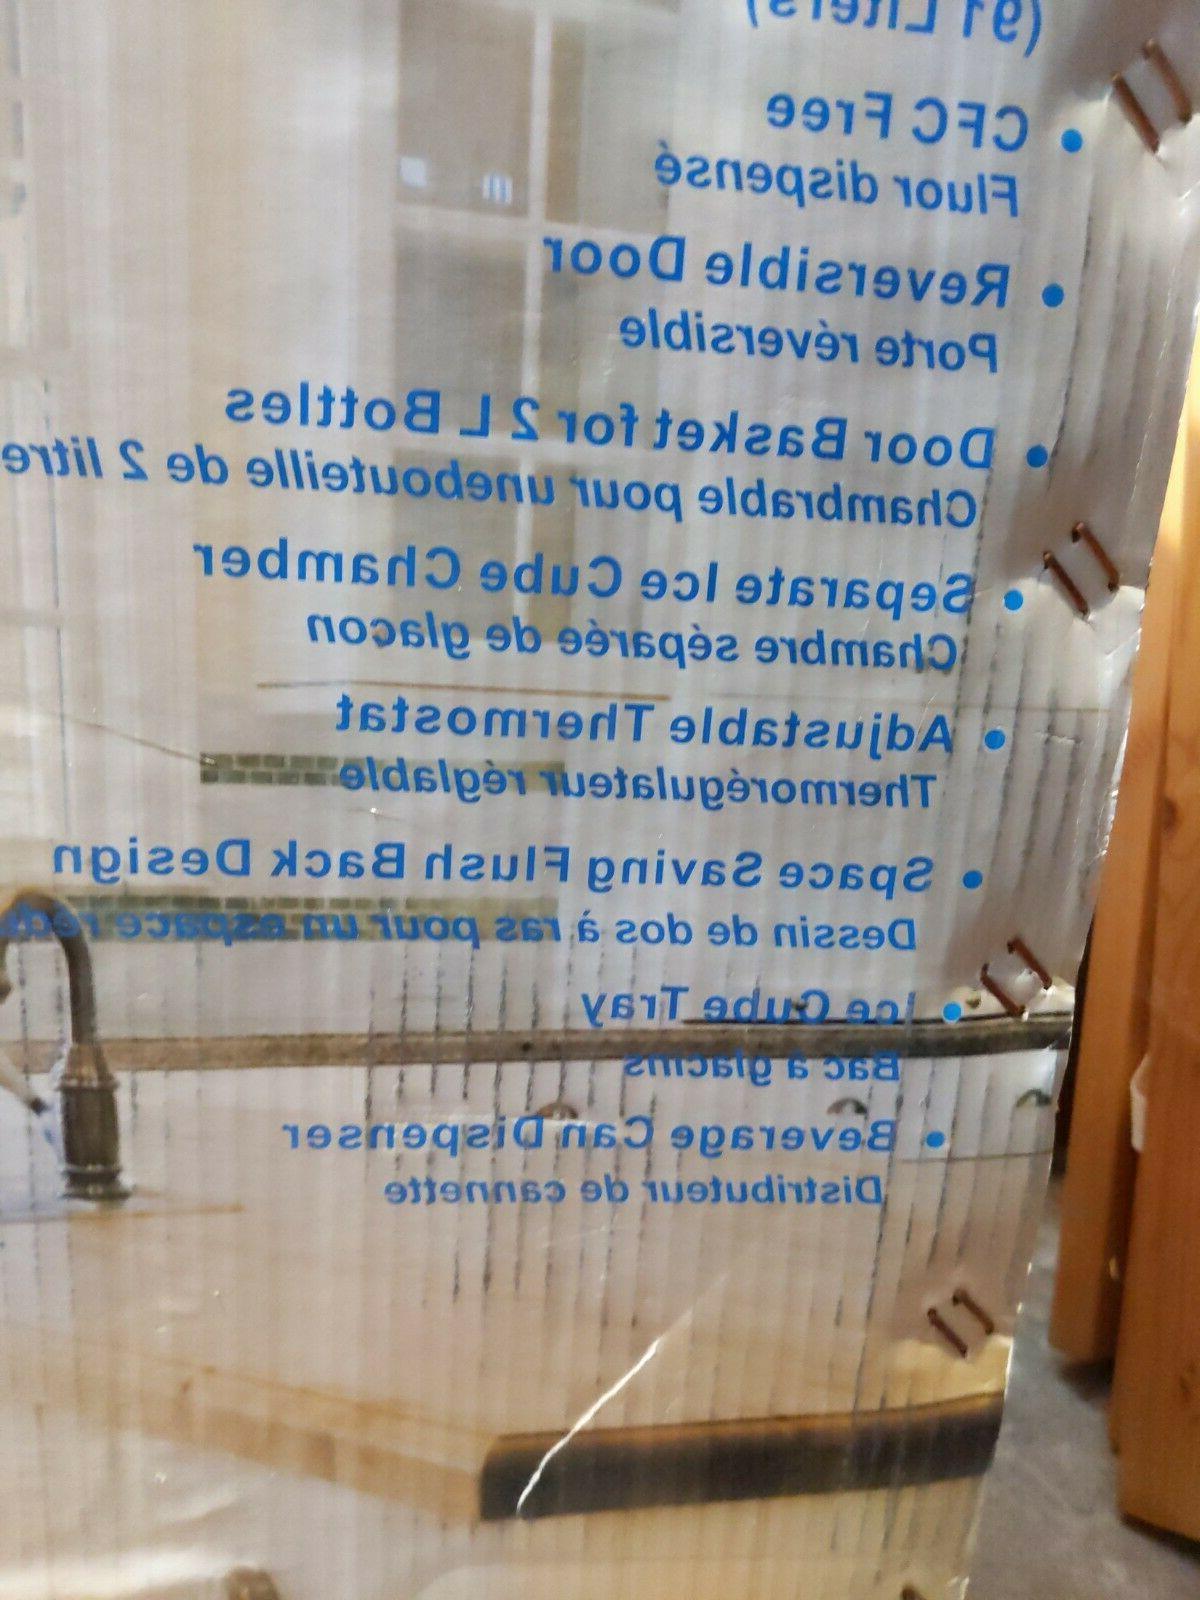 Igloo Refrigerator Open Box Cosmetic Damage 3.2